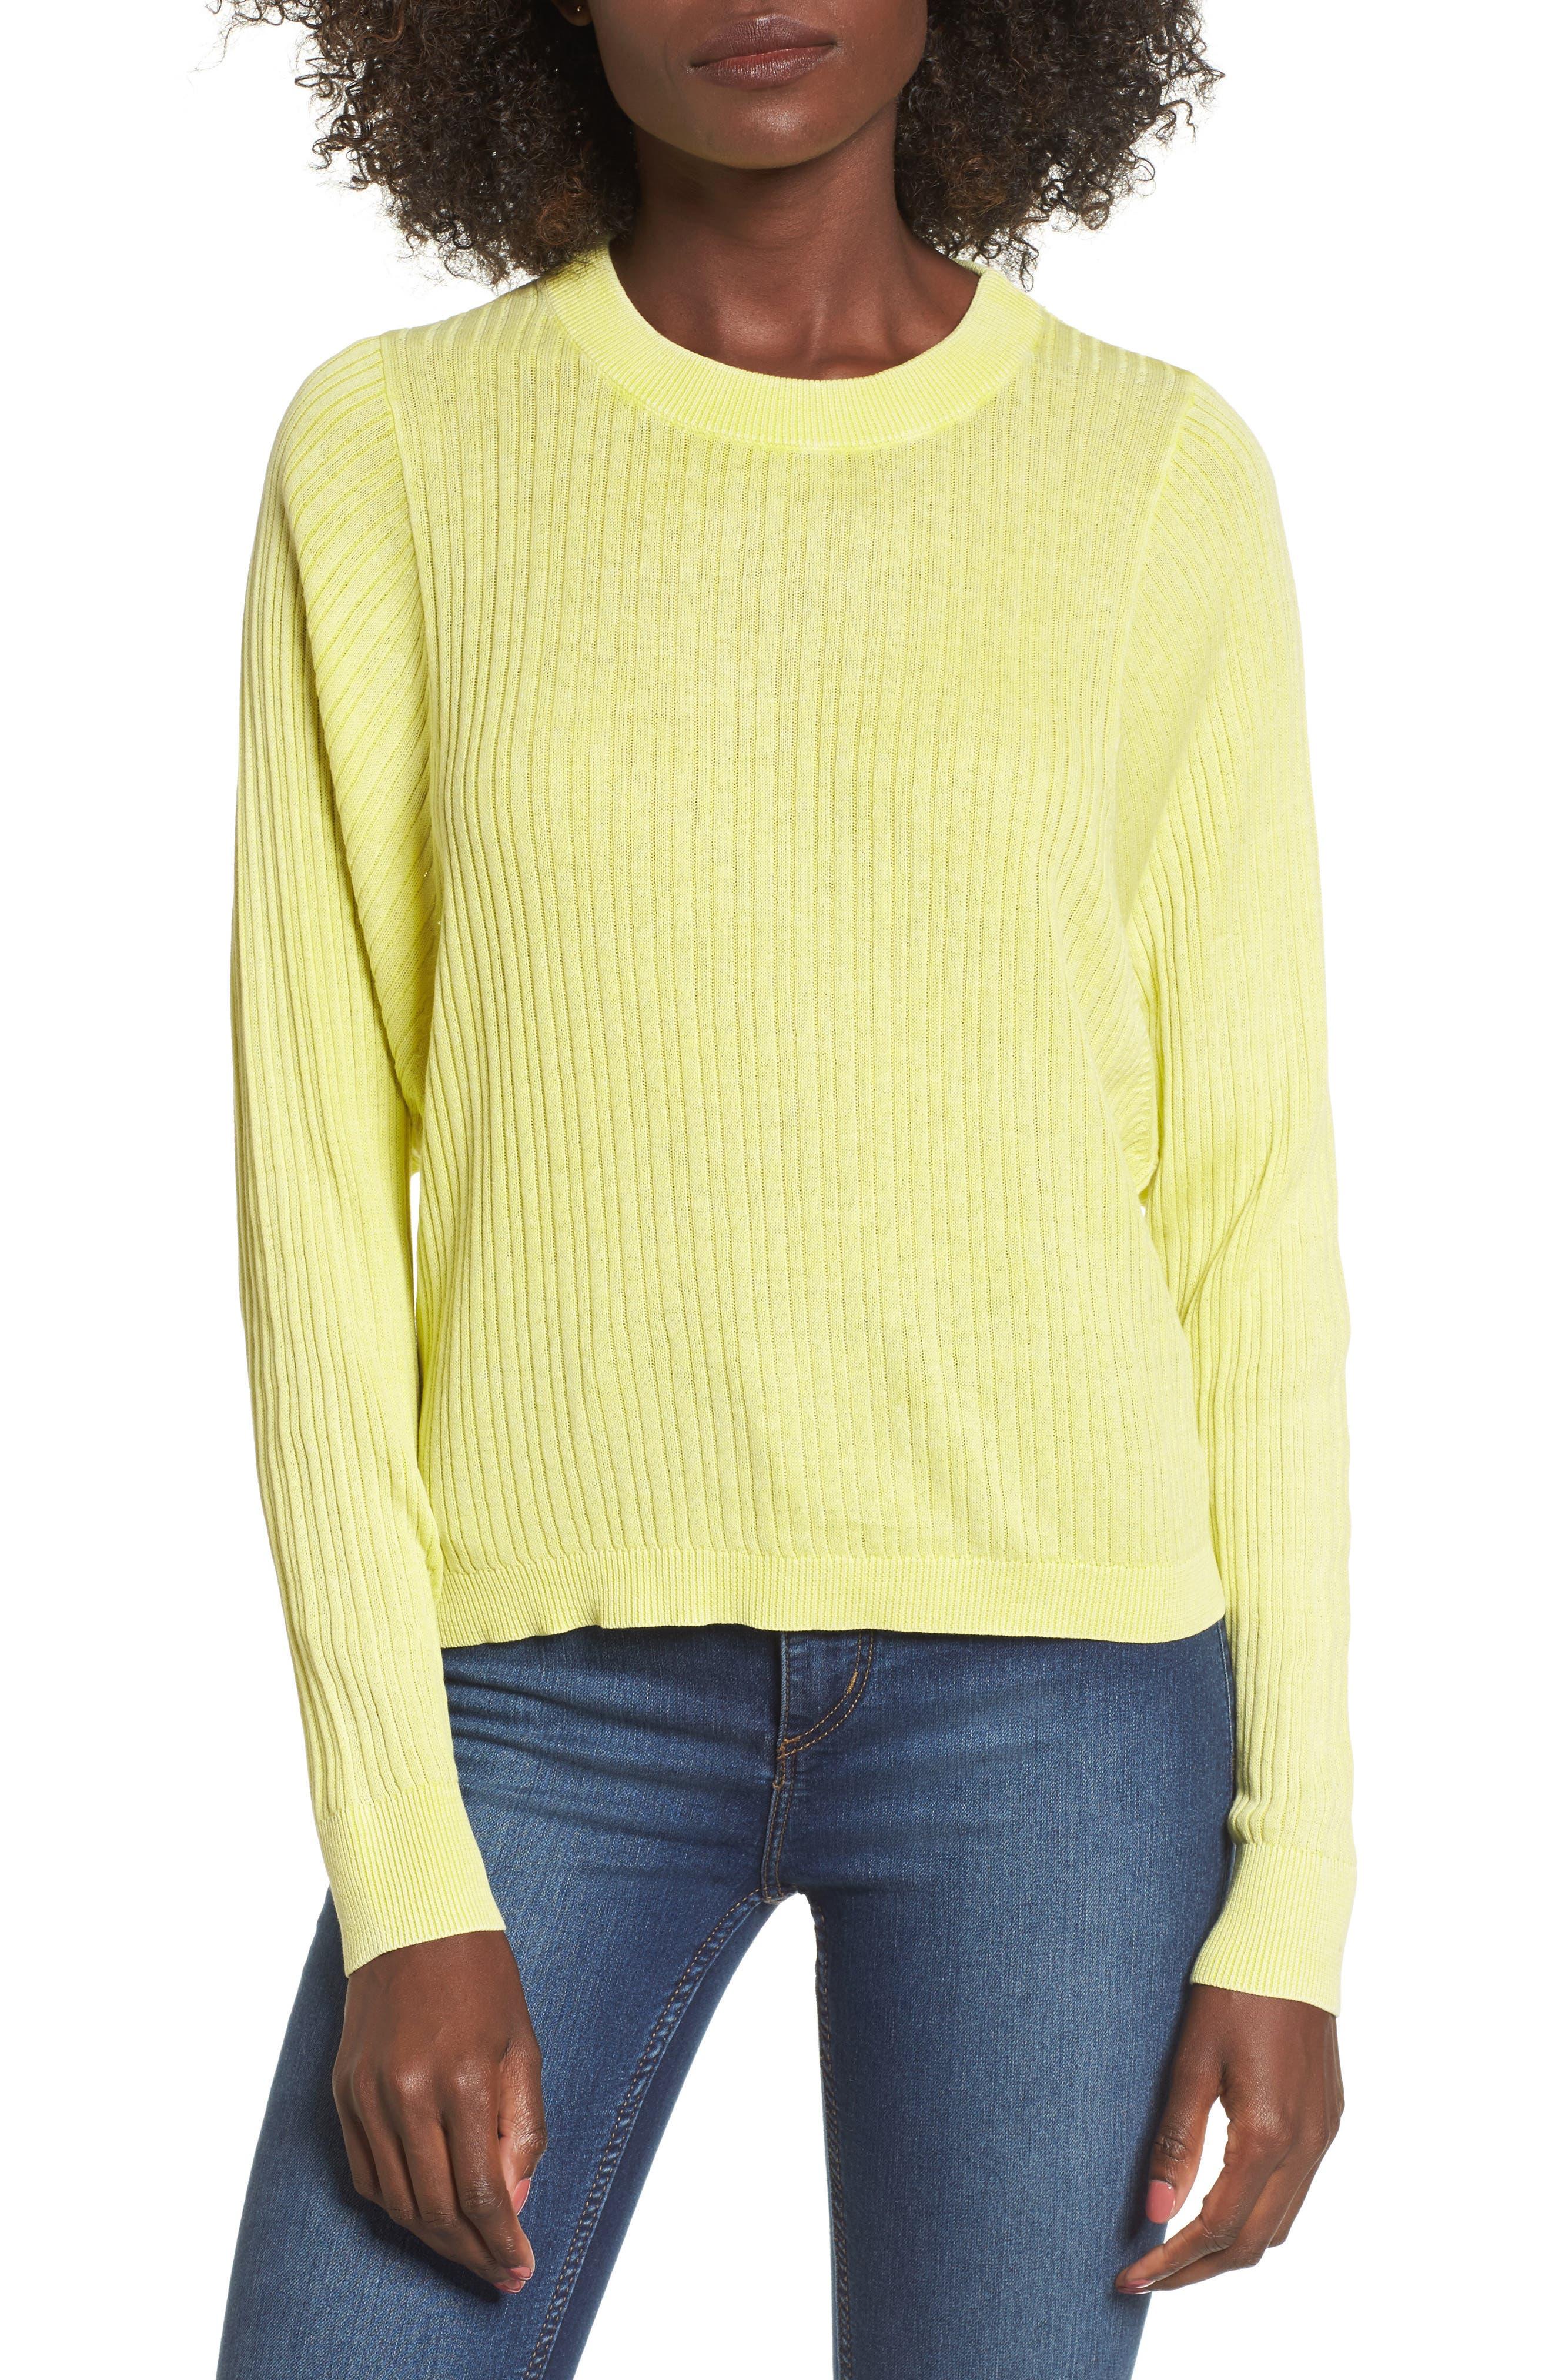 Main Image - BP. Crewneck Variegated Rib-Knit Sweater